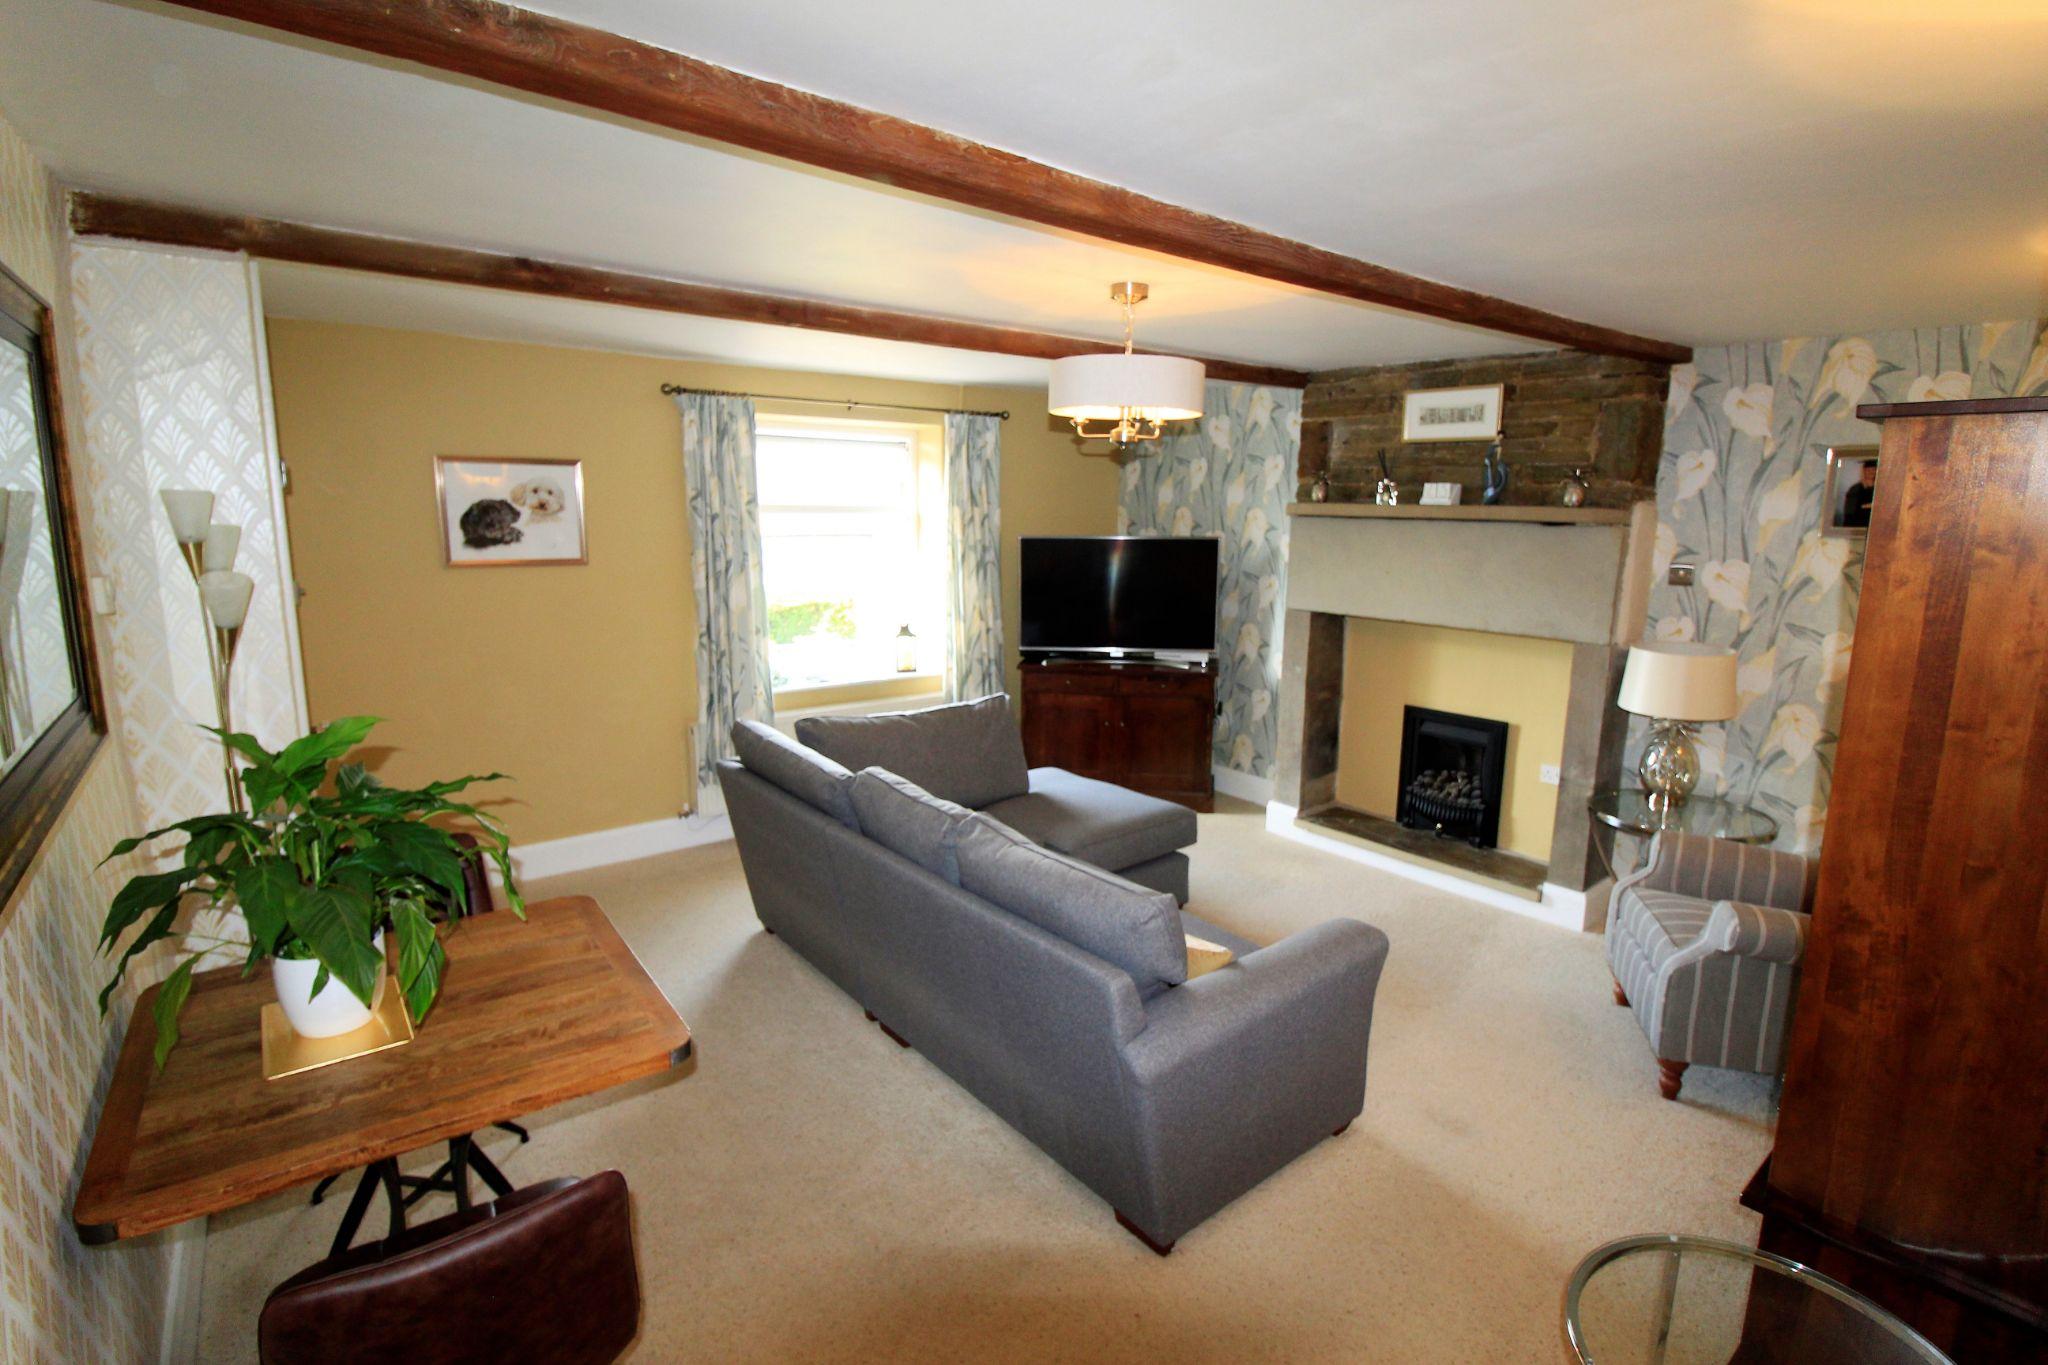 2 bedroom cottage house SSTC in Huddersfield - Lounge